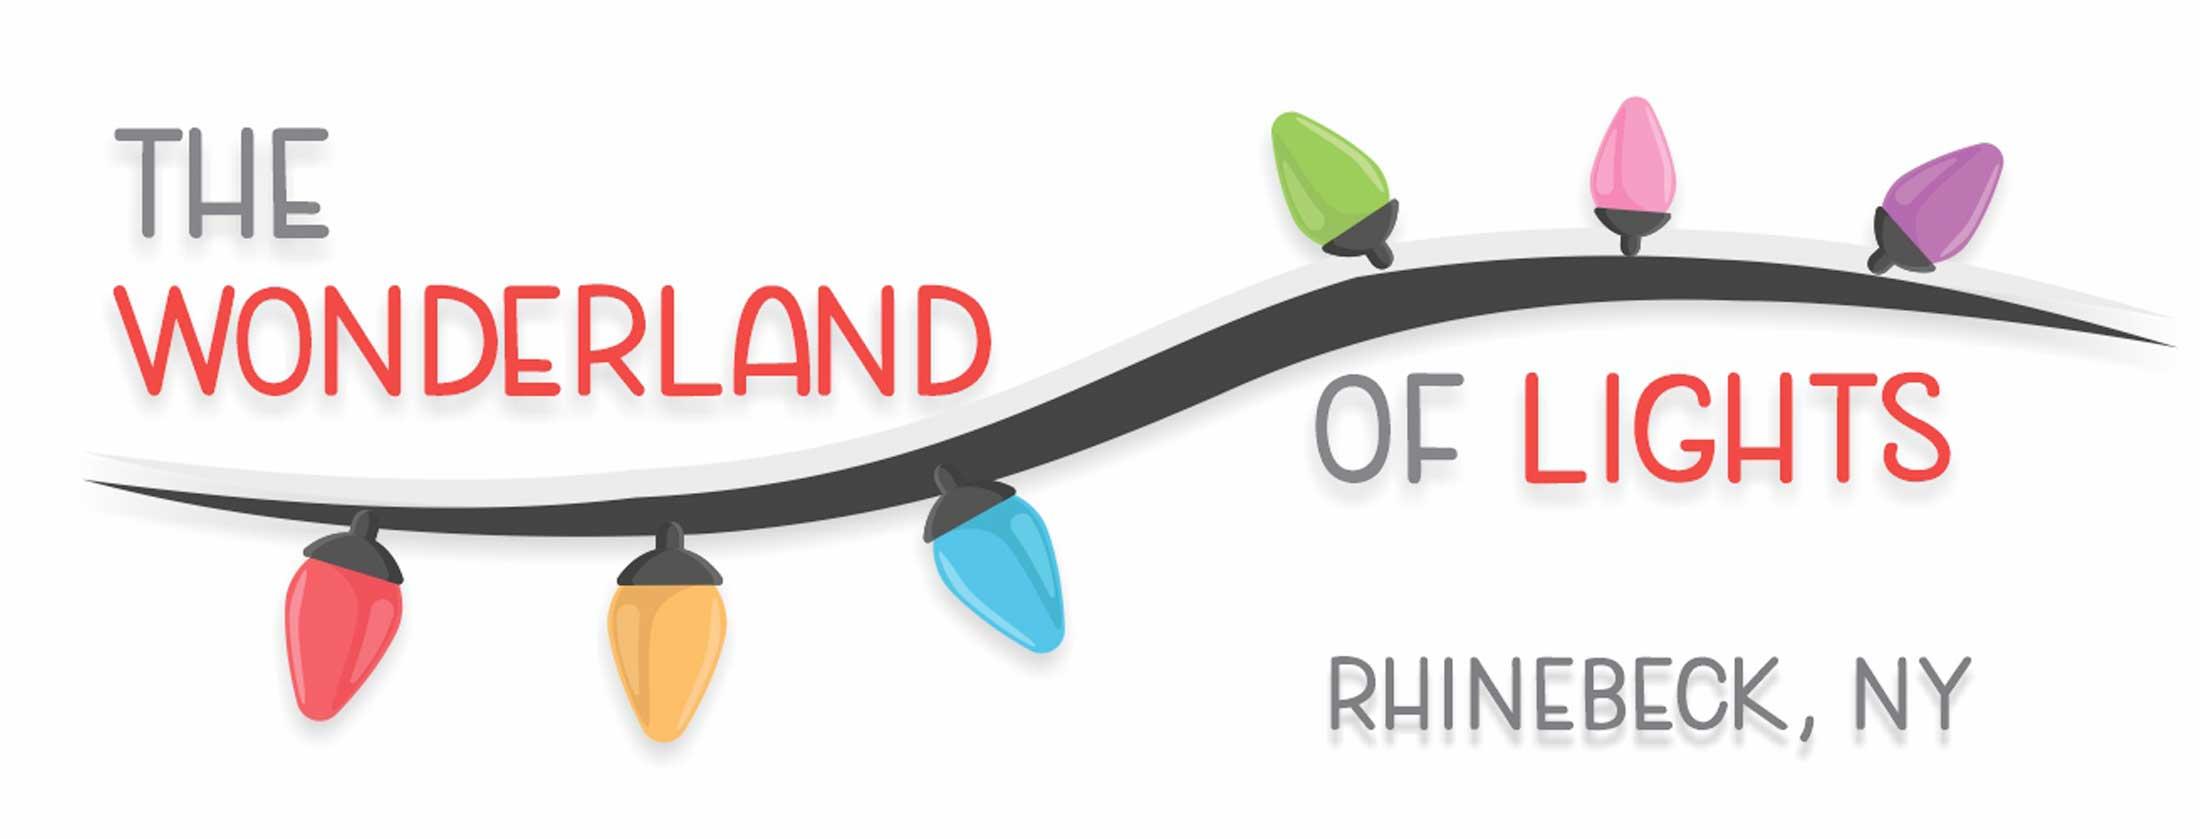 The Wonderland of LIghts - Rhinebeck